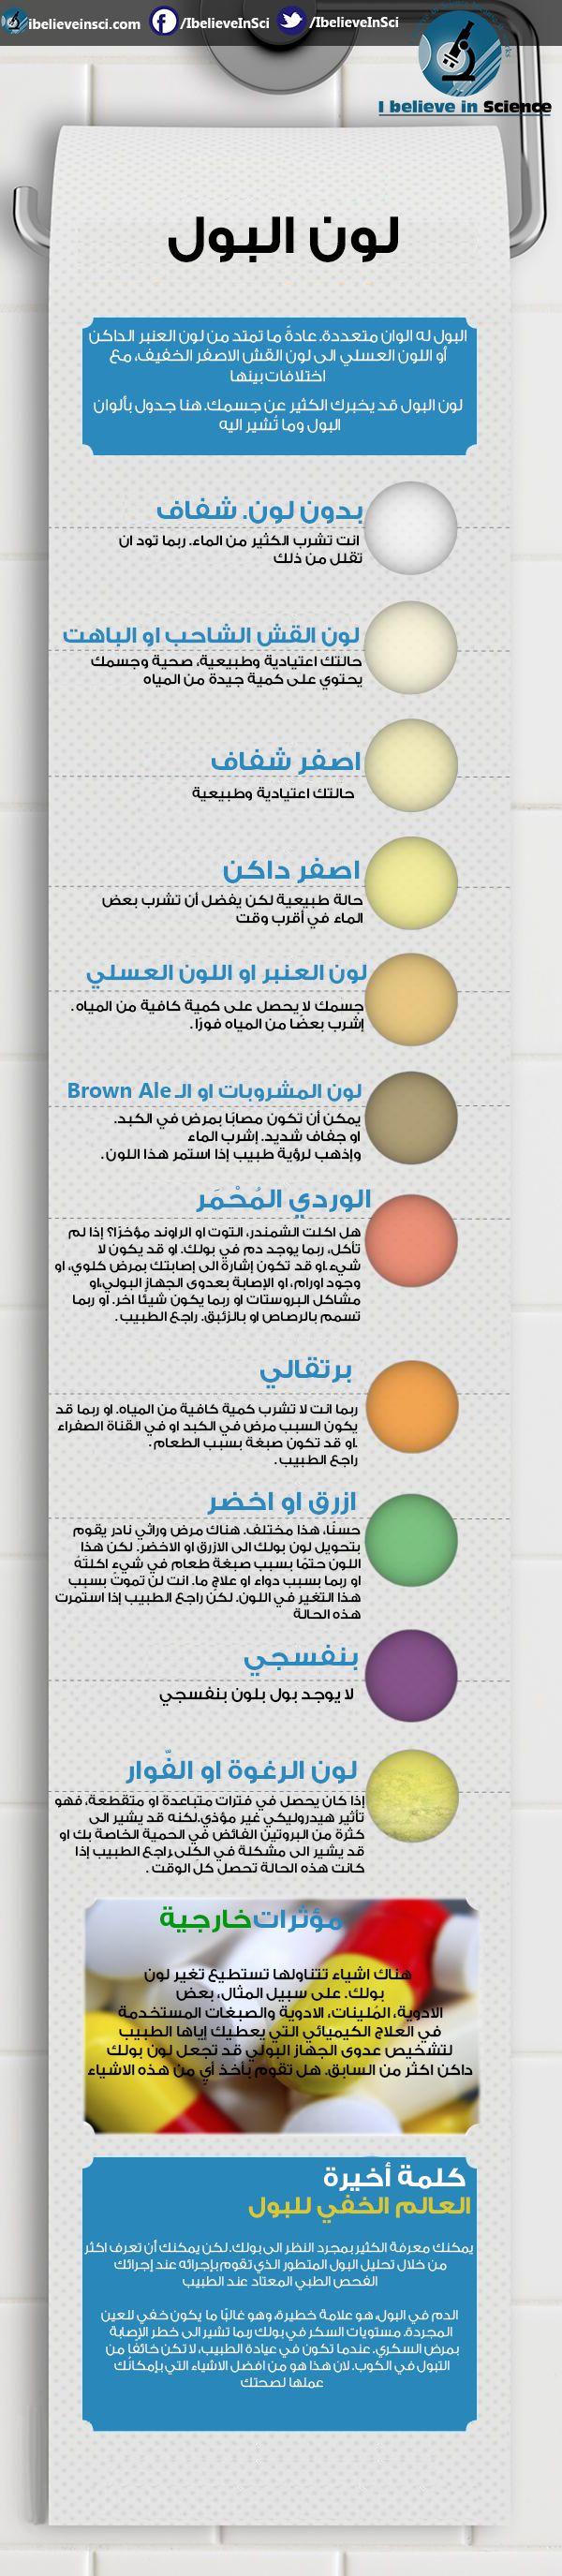 لون البول و دلائله Health And Nutrition Health Facts Fitness Health Facts Food